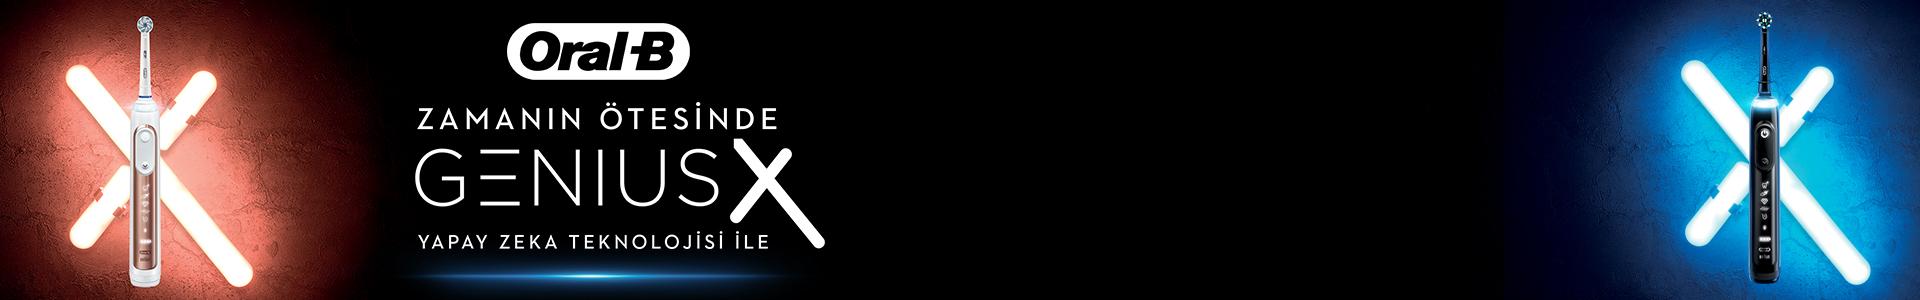 Oral-B_BraunShop-vitrin.jpg (307 KB)